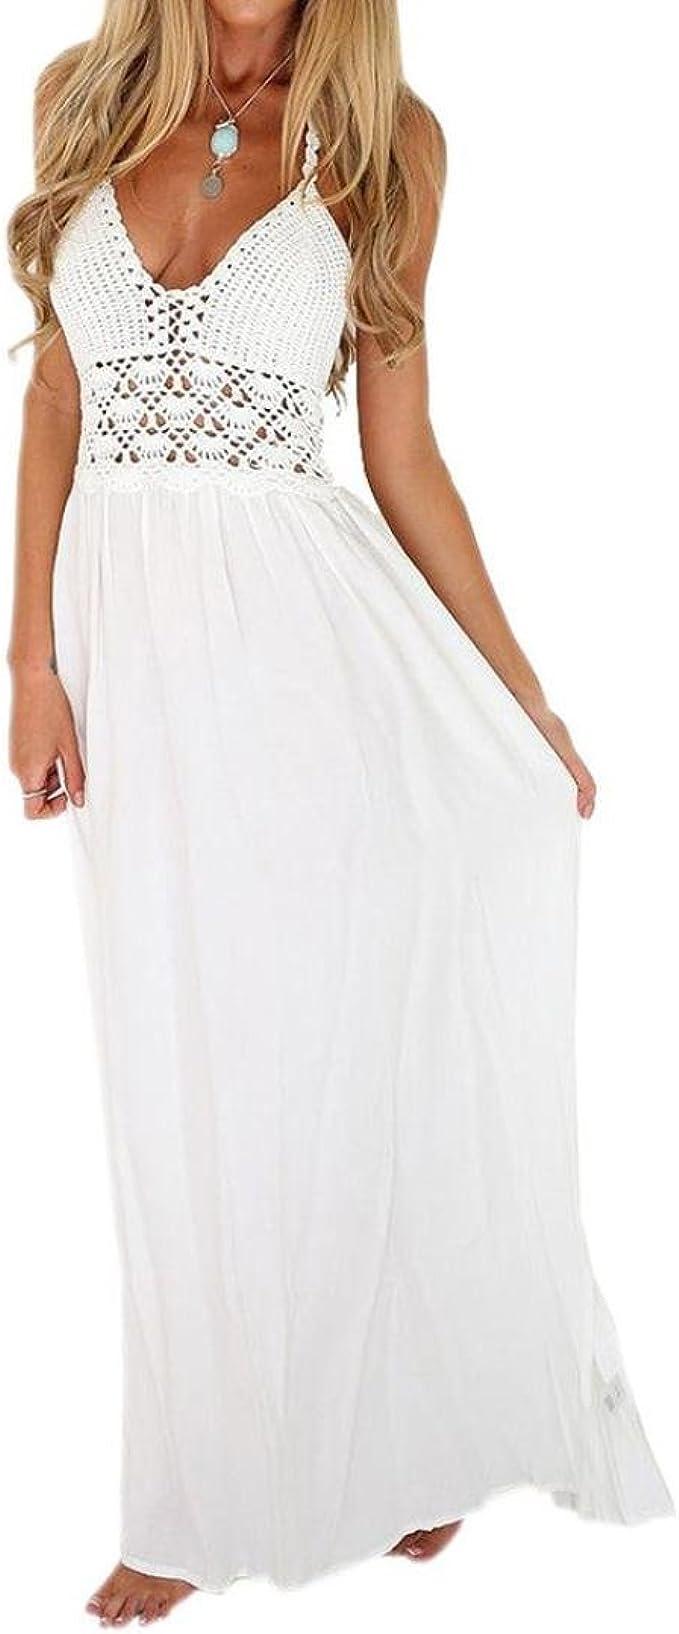 LUCKDE Maxirock Boho, Strandkleider Damen Bohemian Dress